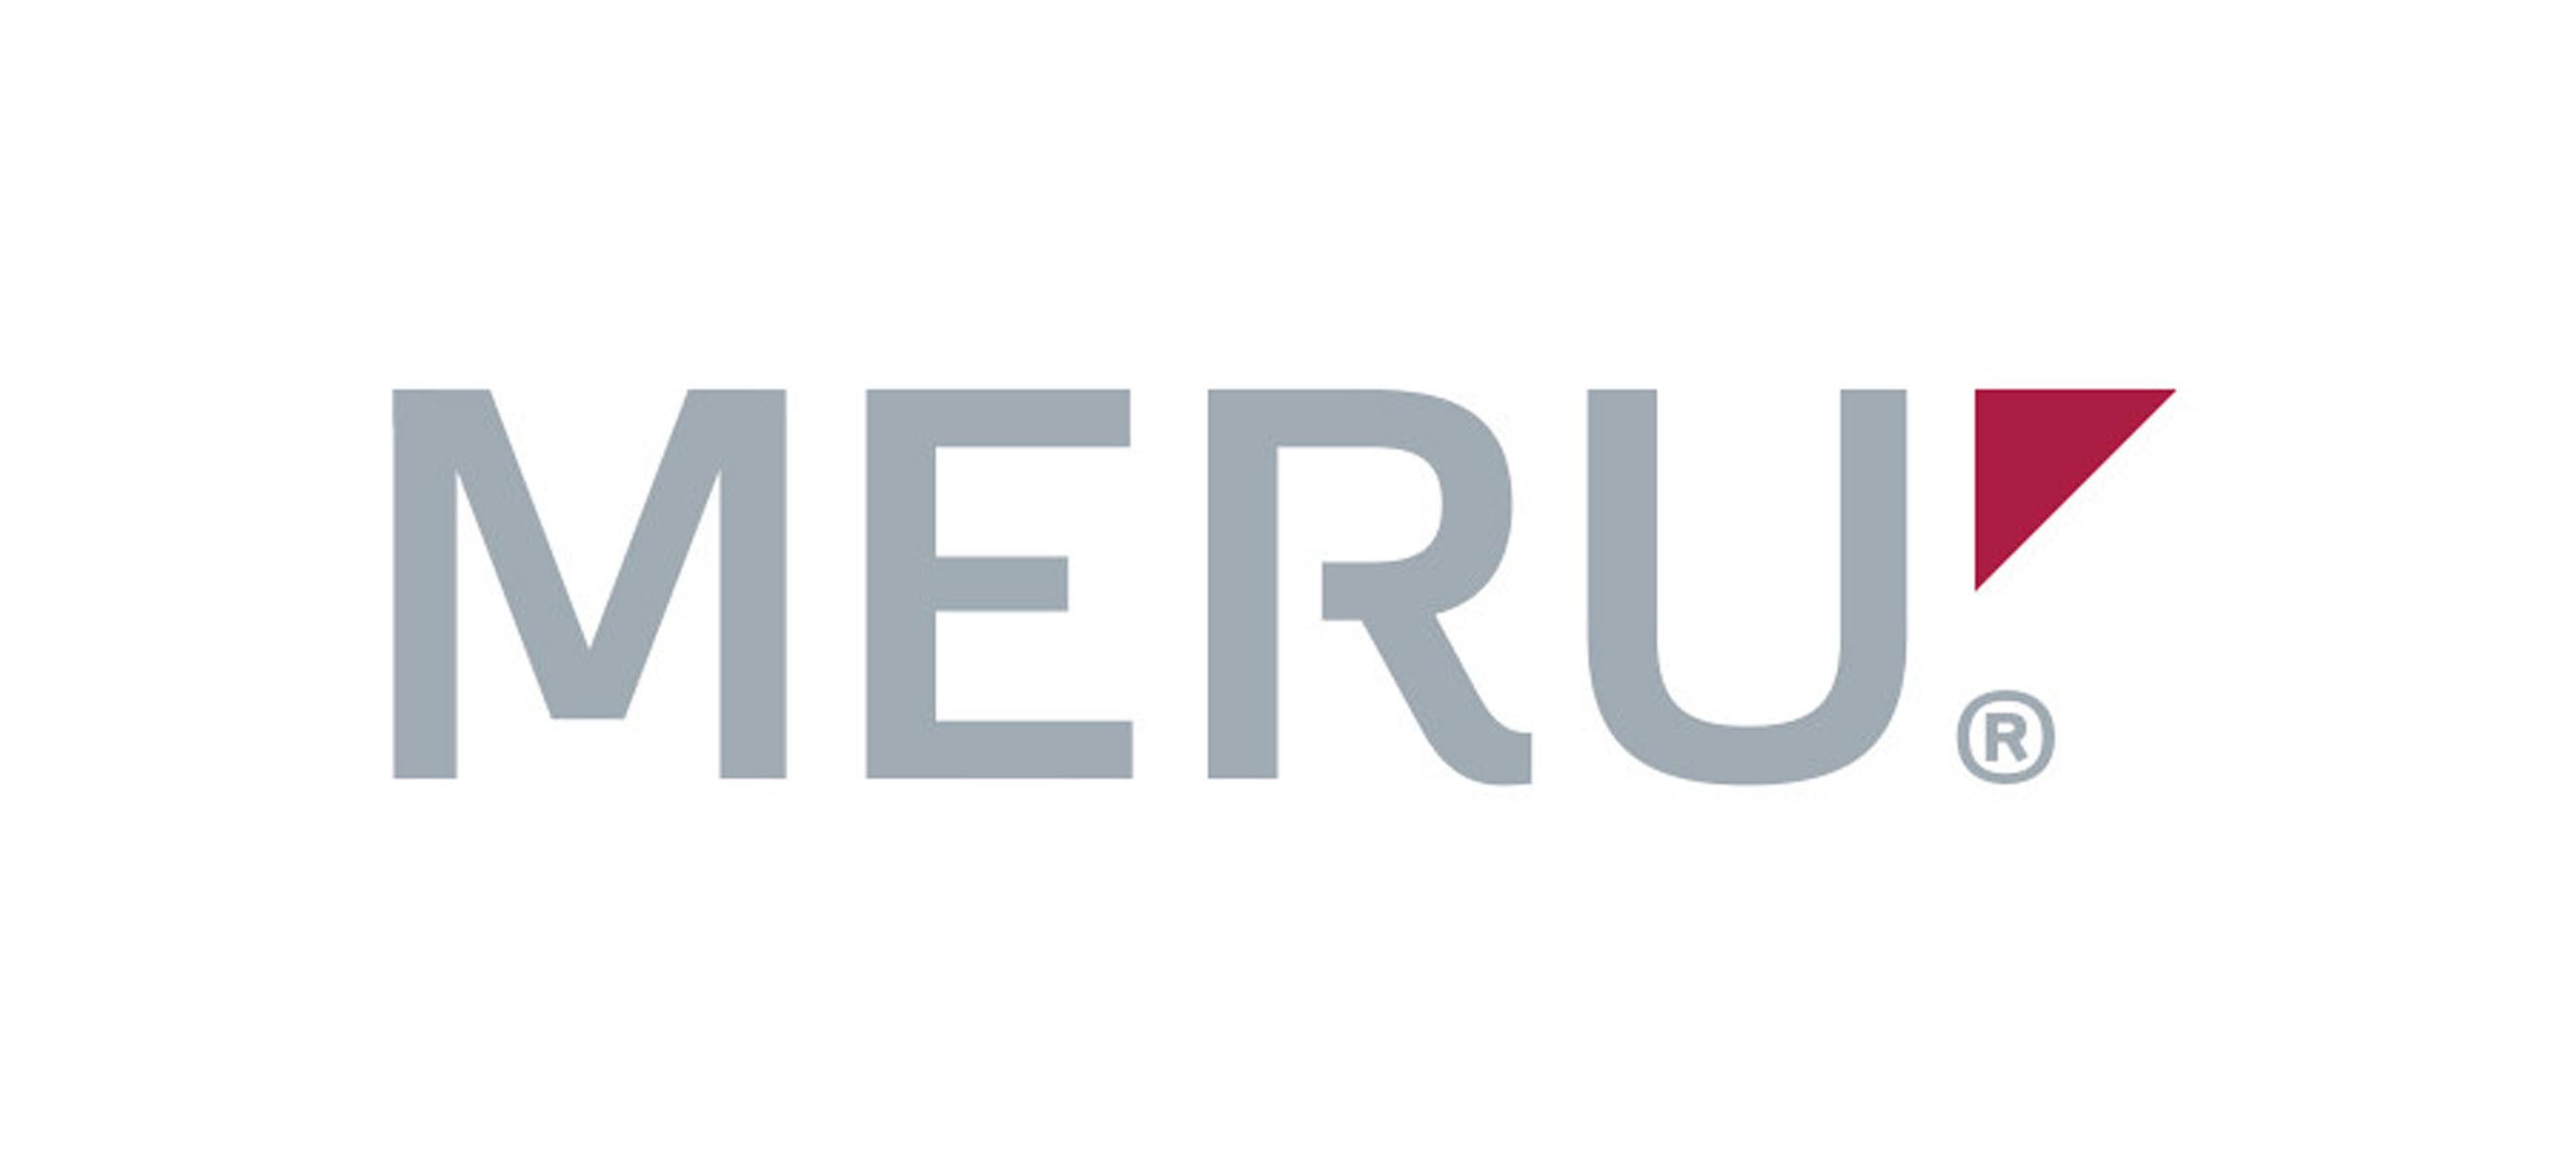 Meru Networks logo.